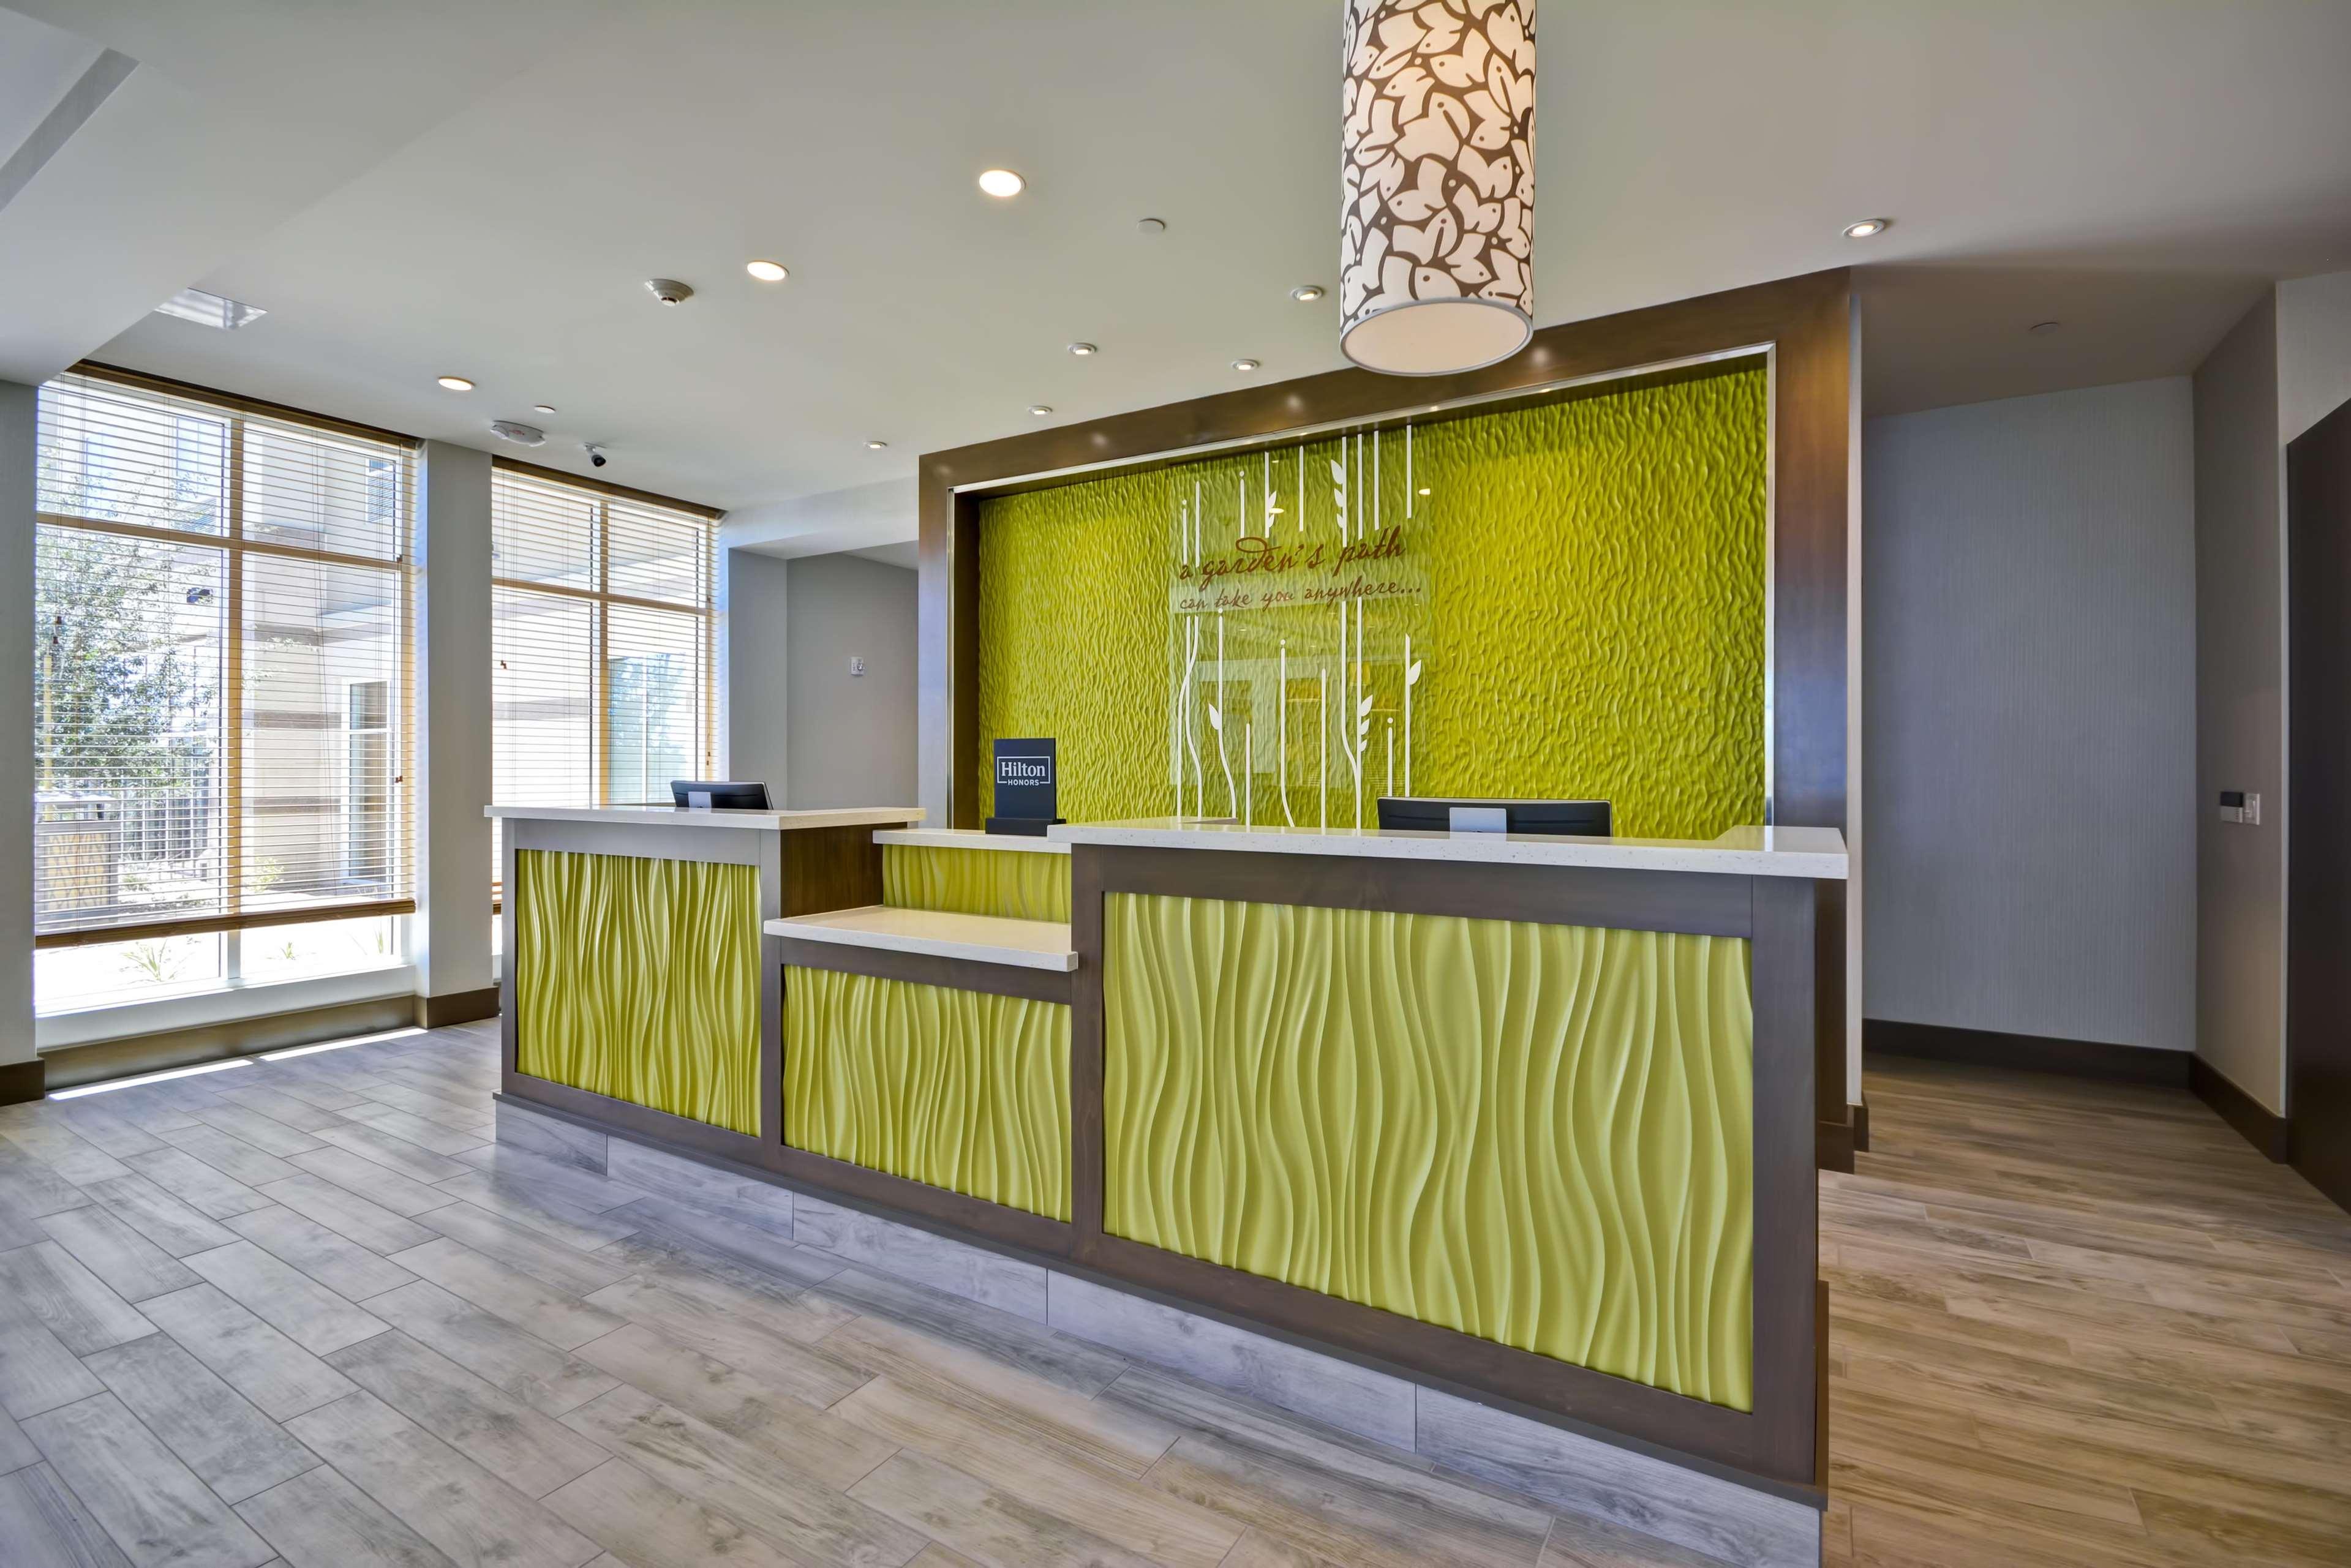 Hilton Garden Inn Phoenix/Tempe ASU Area image 6